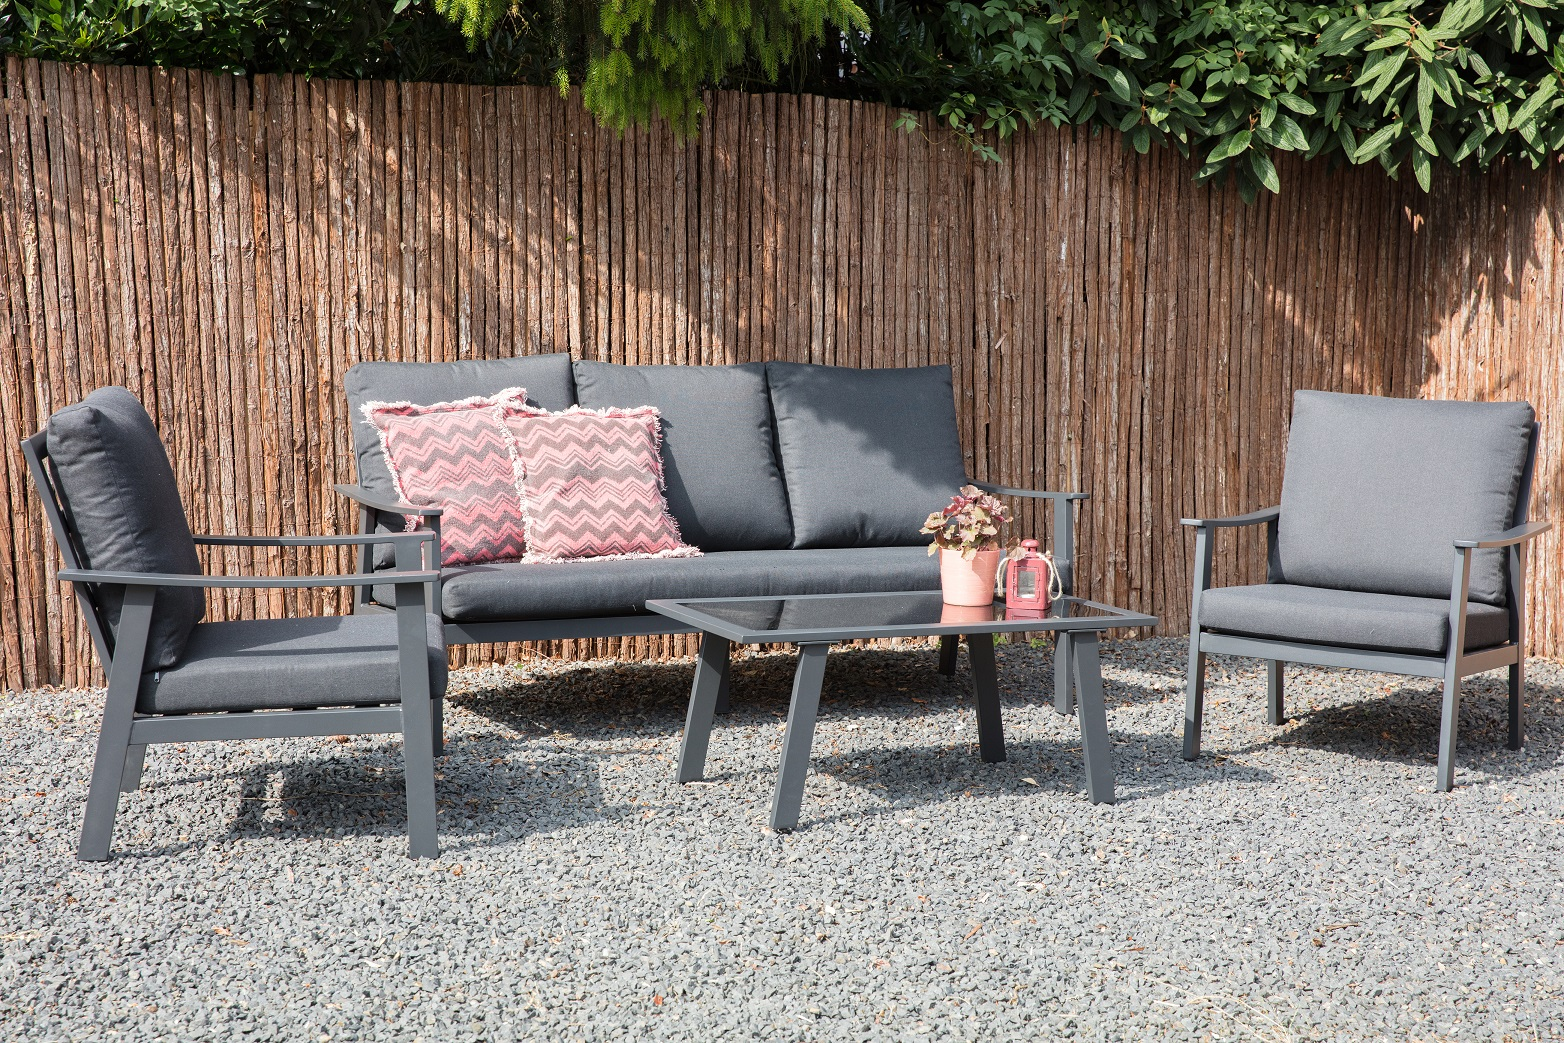 Bacard Aluminium Lounge Gartenmobel Sitzgruppe Grau Lounge Mobel